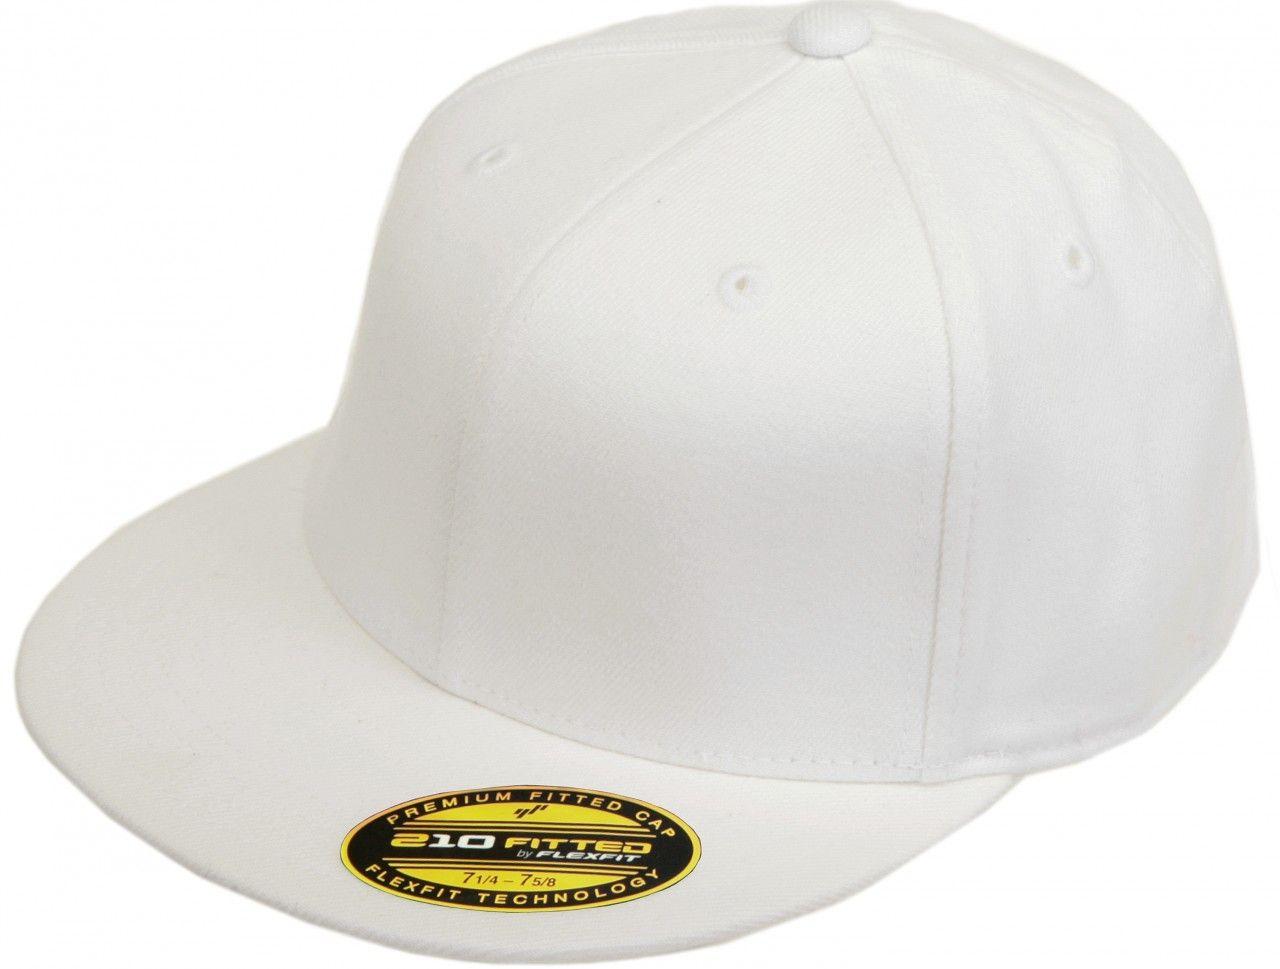 aa484664ee252 6210 Flexfit Premium Fitted Flatbill Baseball Blank Plain Hat Cap Flex Fit  210